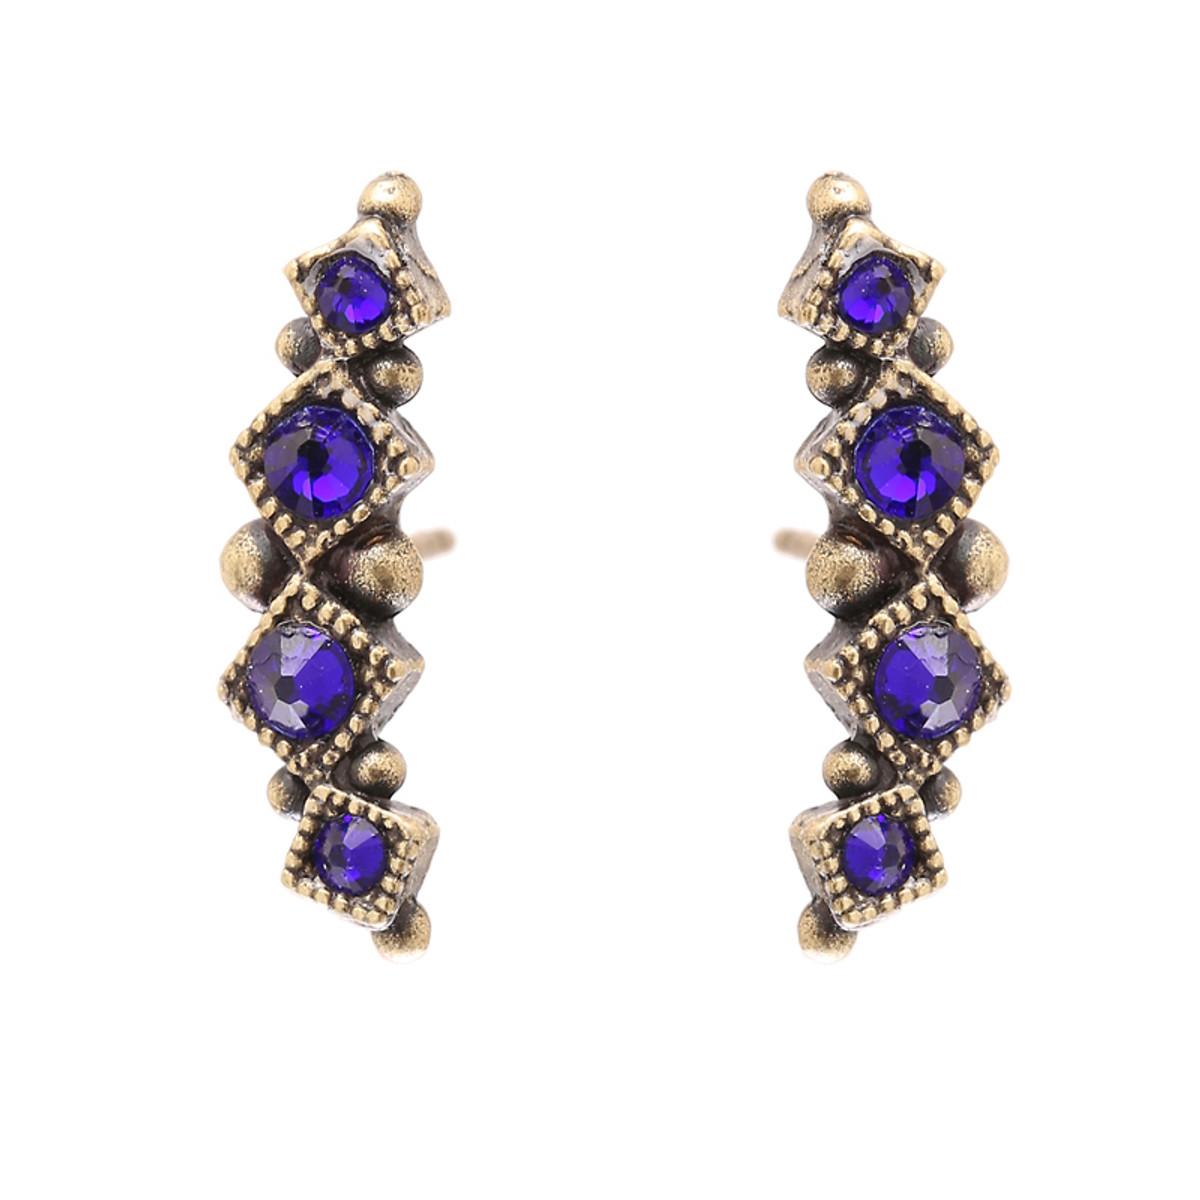 Michal Negrin Evolution Earrings - Multi Color